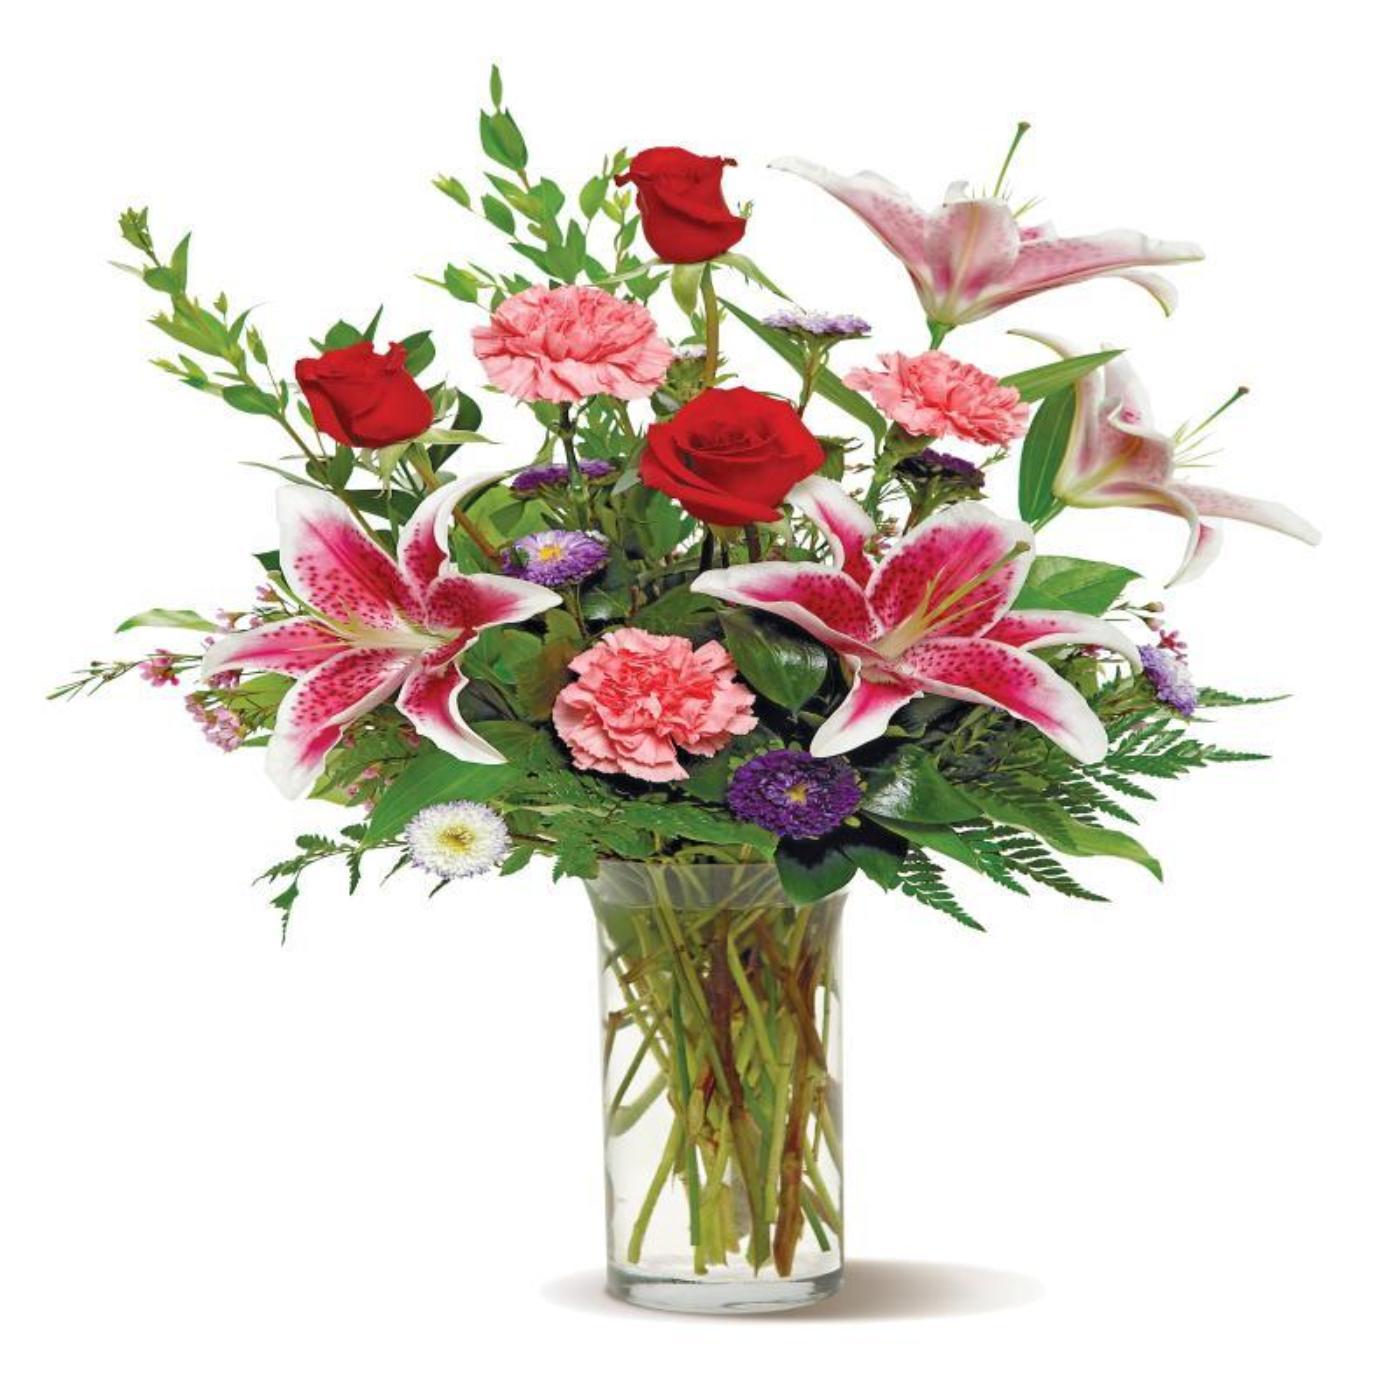 From the Garden Assorted Flowers Glass Vase Arrangement